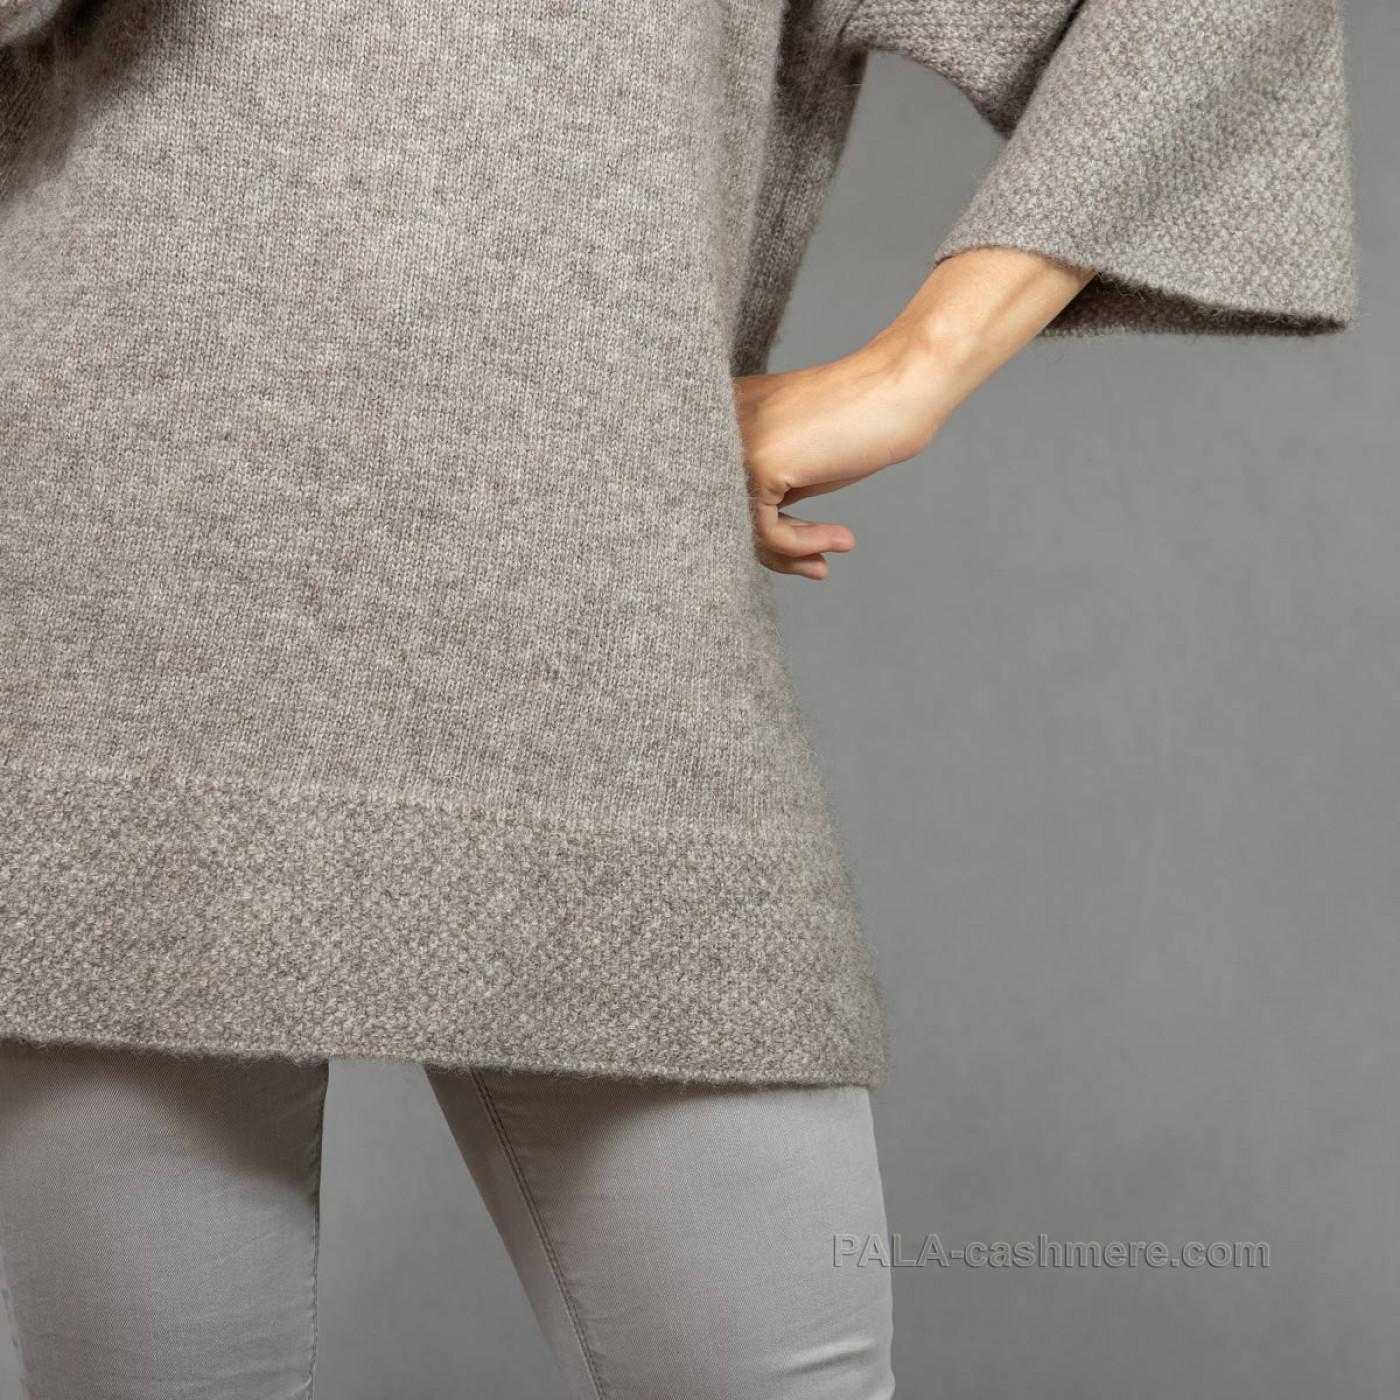 Женский джемпер из шерсти яка